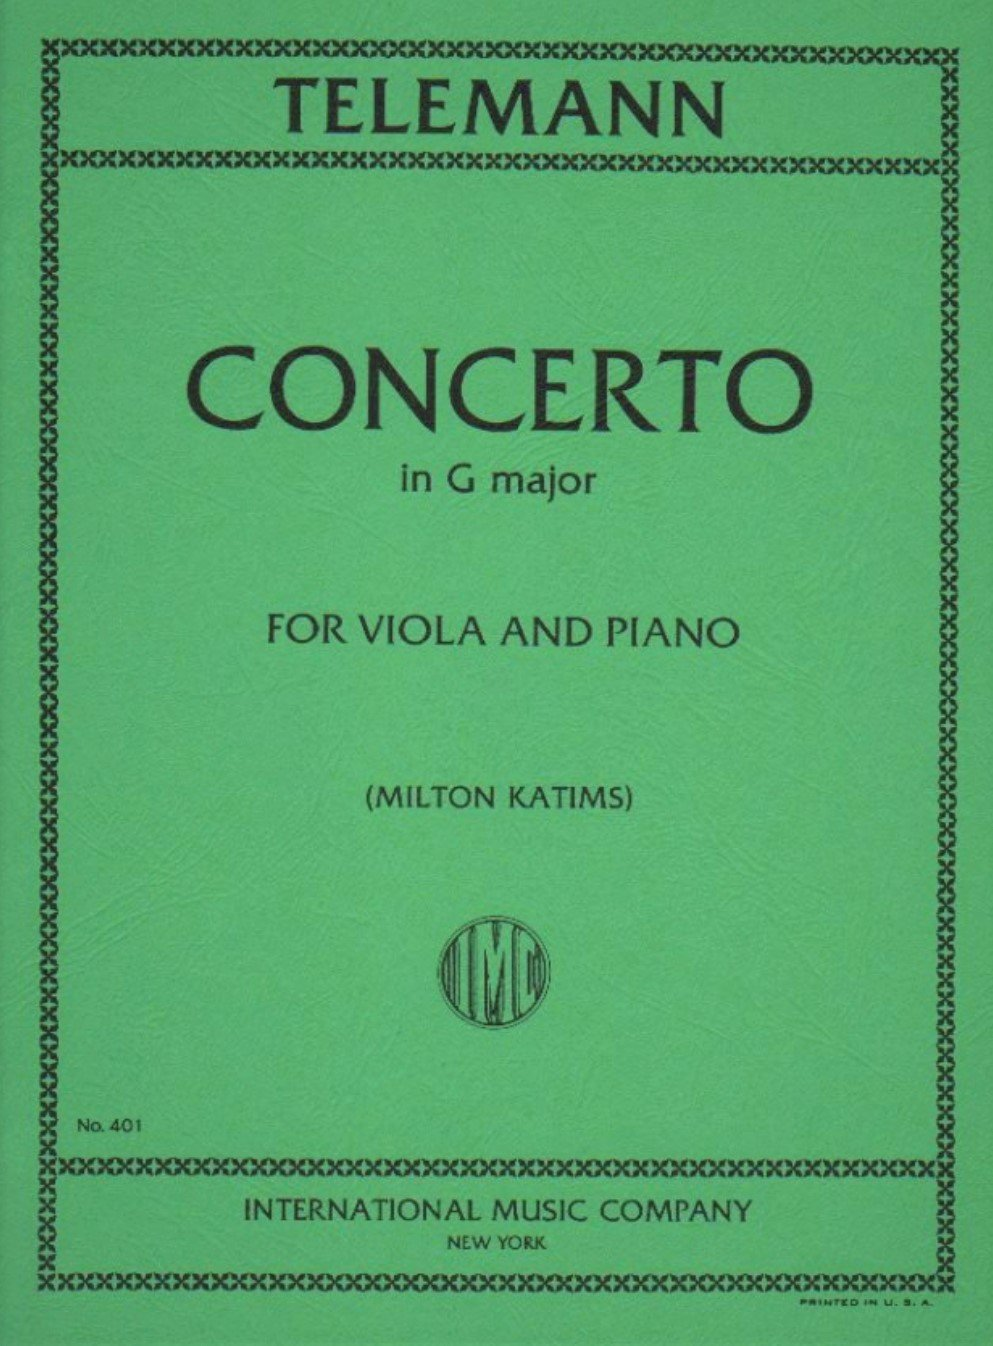 Concerto in G major - Telemann - Viola -  Katims - International